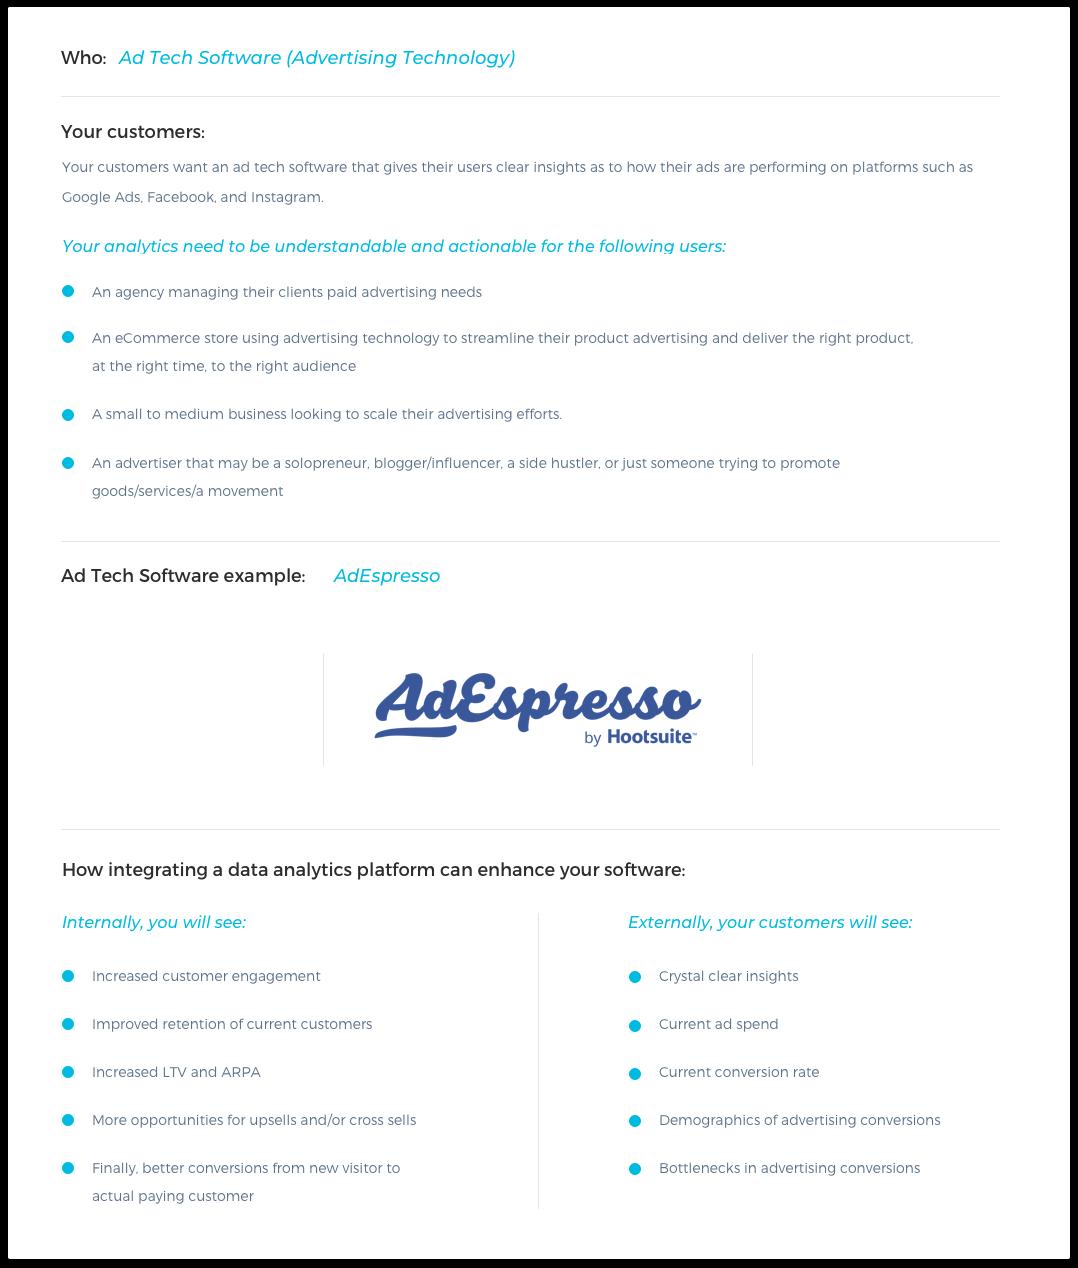 AdTech Software Example